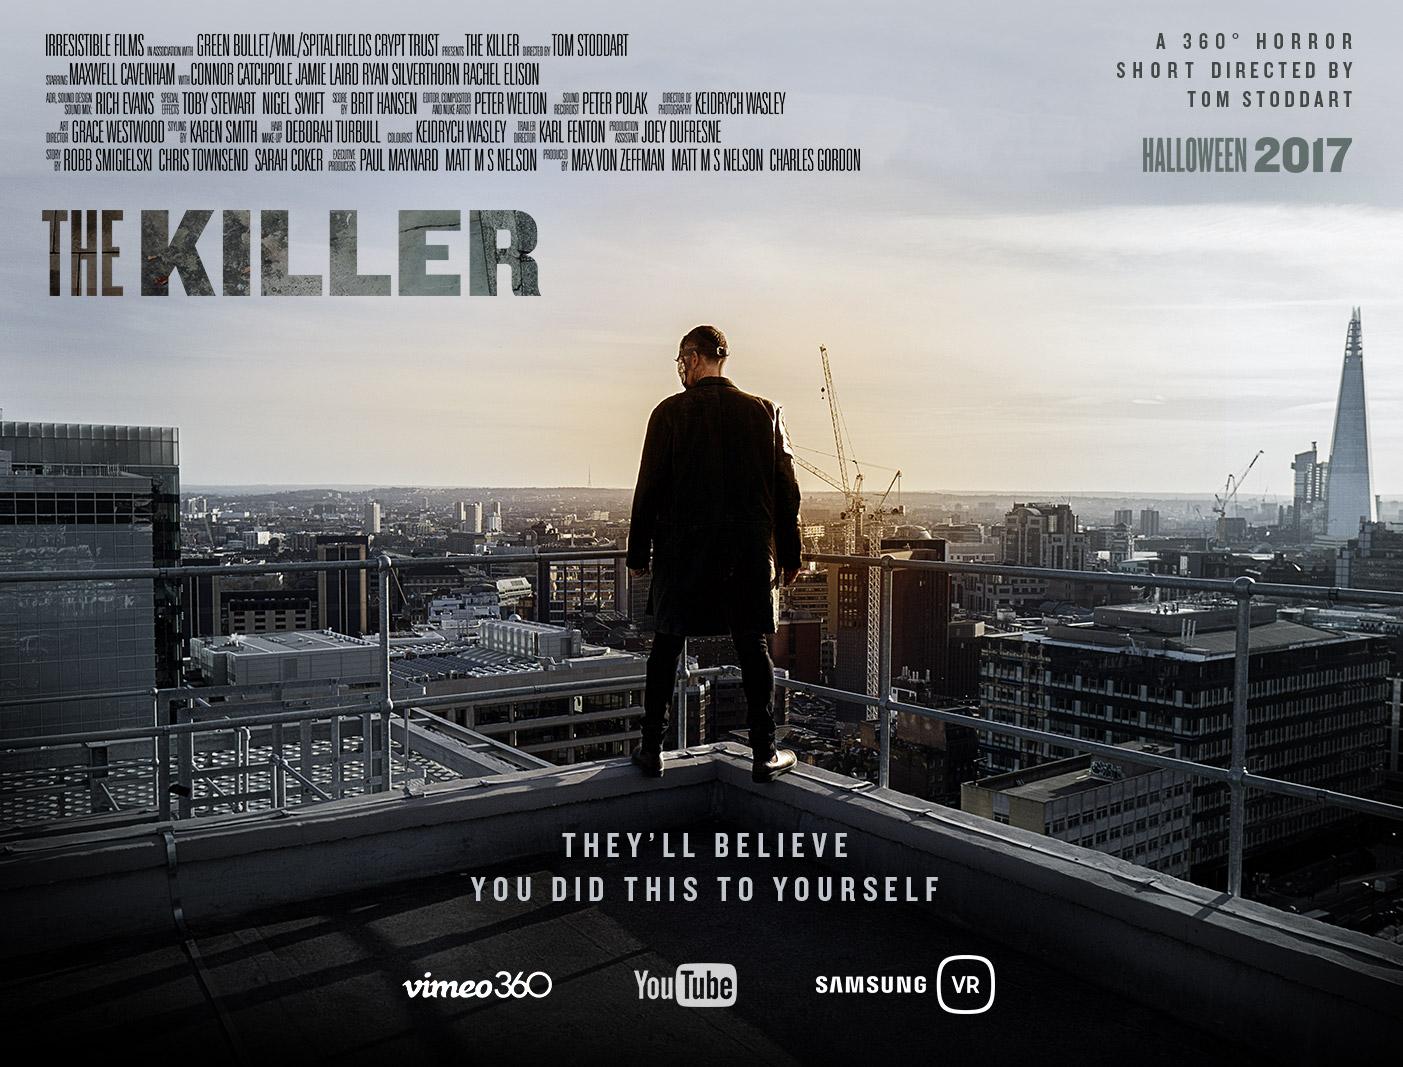 TheKiller_HortizontalPosters_citySQ.jpg